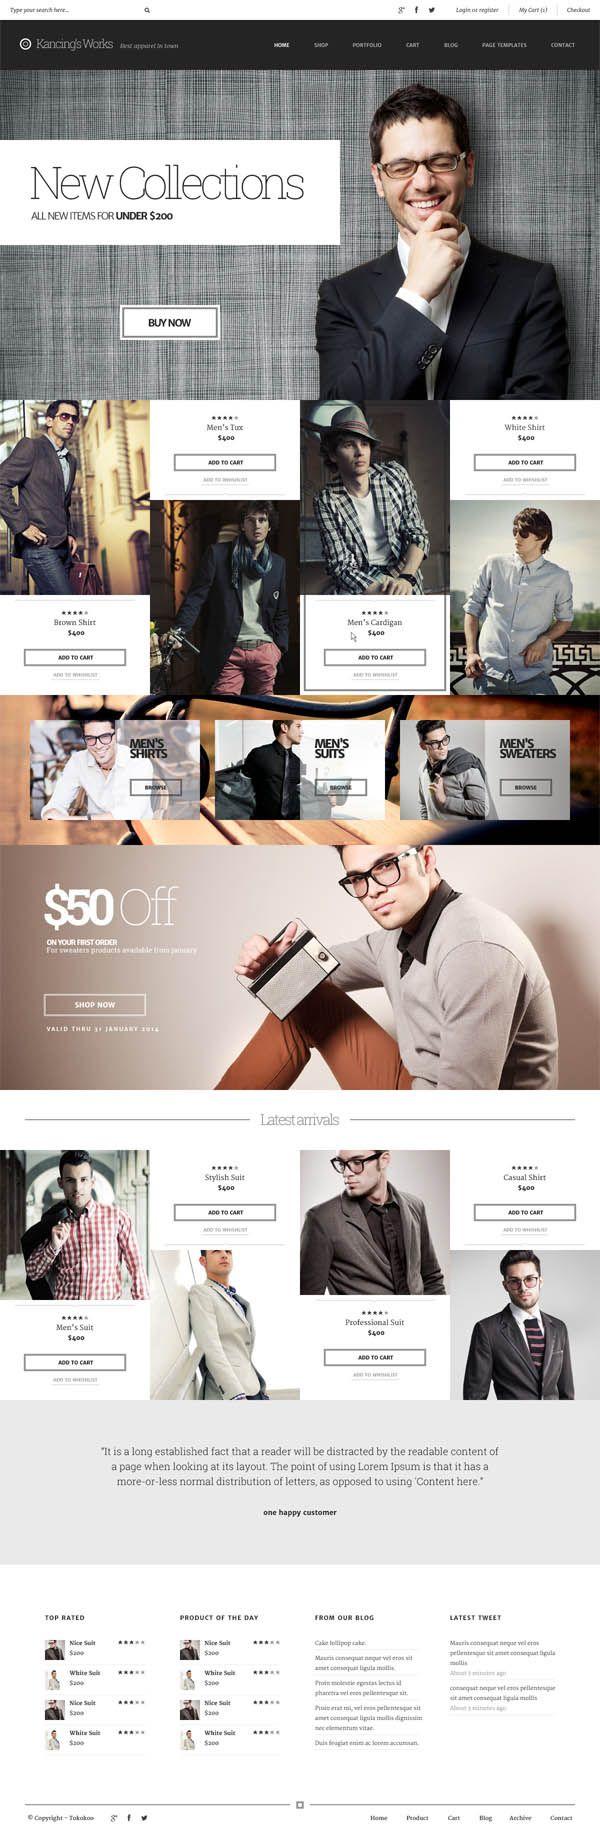 Kancing : Fashion WooCommerce WordPress Theme #html5themes #responsivewordpressthemes #responsivedesign #html5 #css3